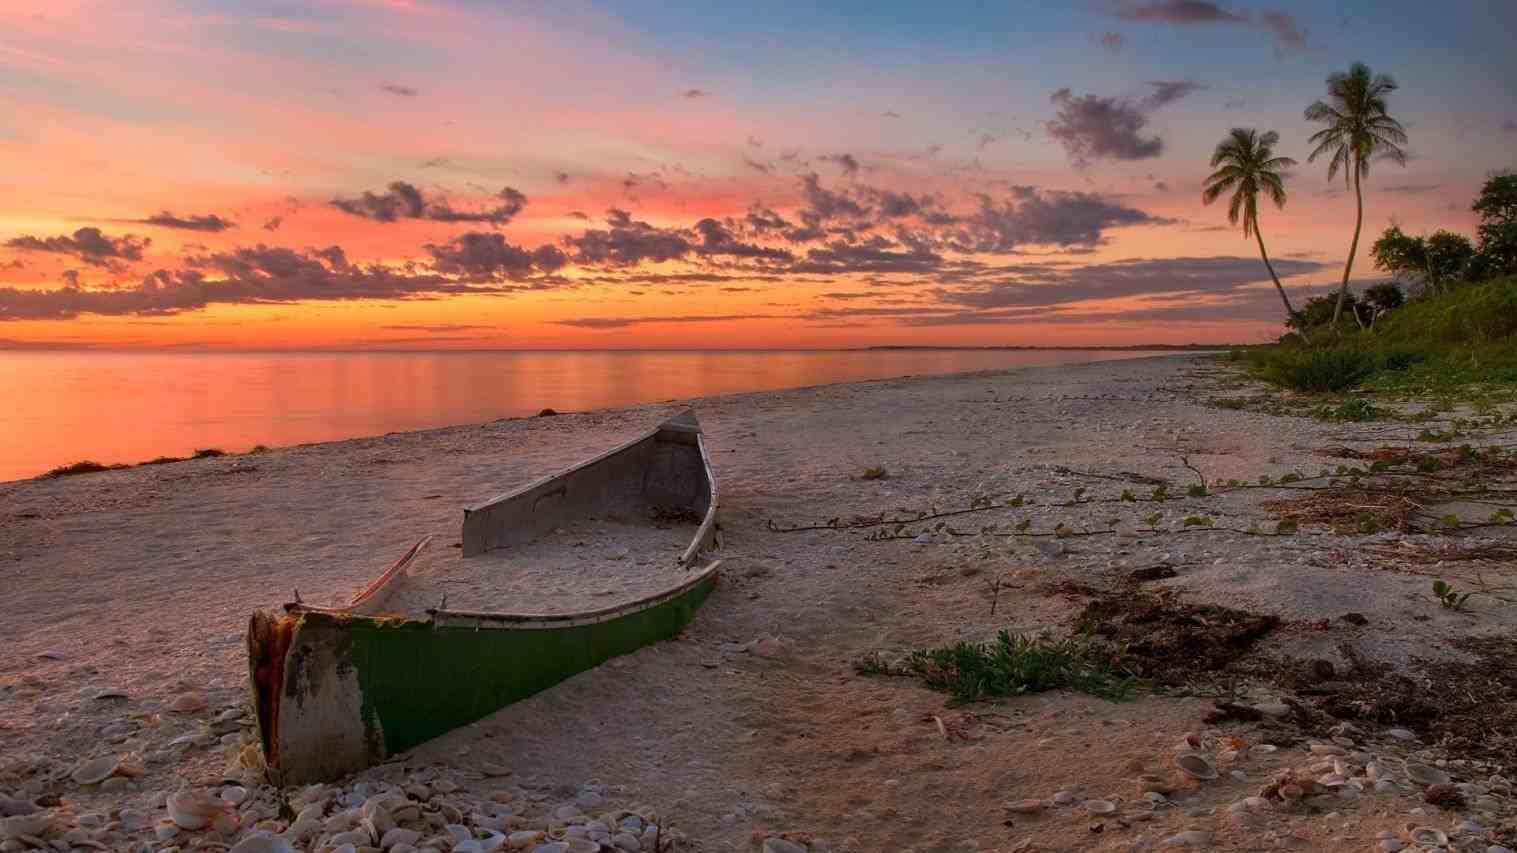 beach wallpaper sunset free desktop backgrounds rhwellscom es key 1517x853